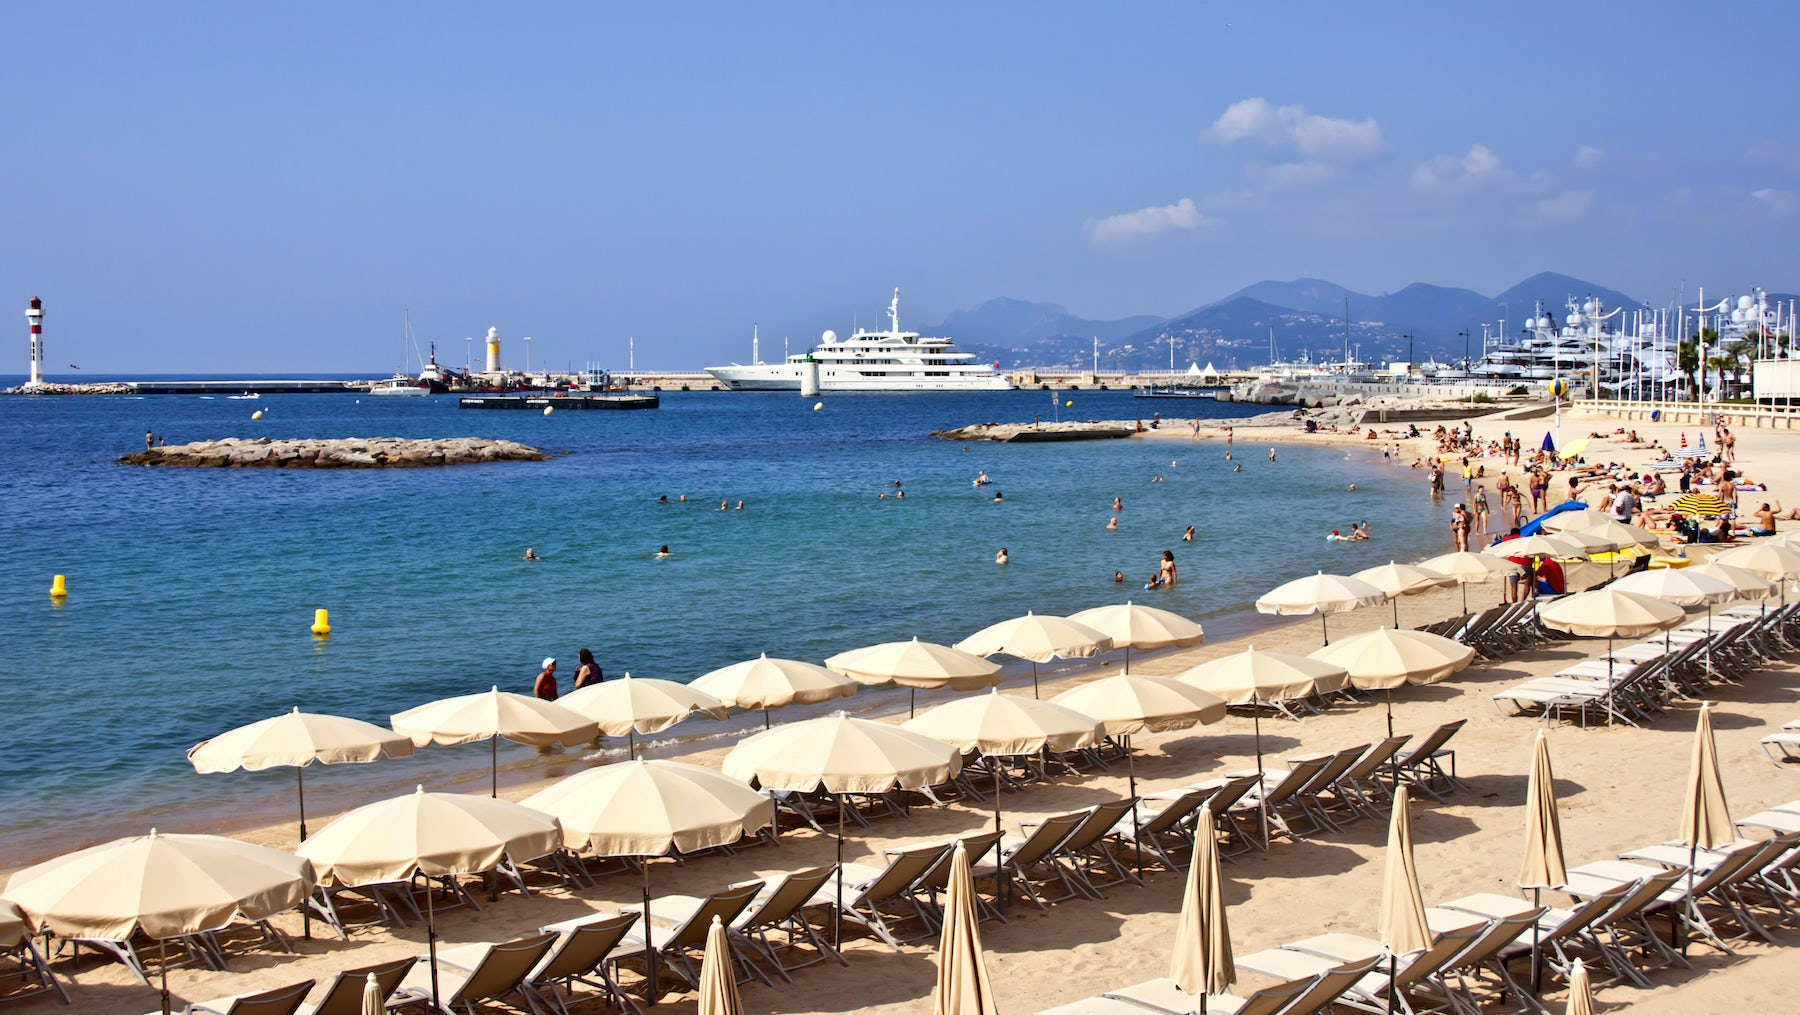 Cannes beach | Source: Shutterstock